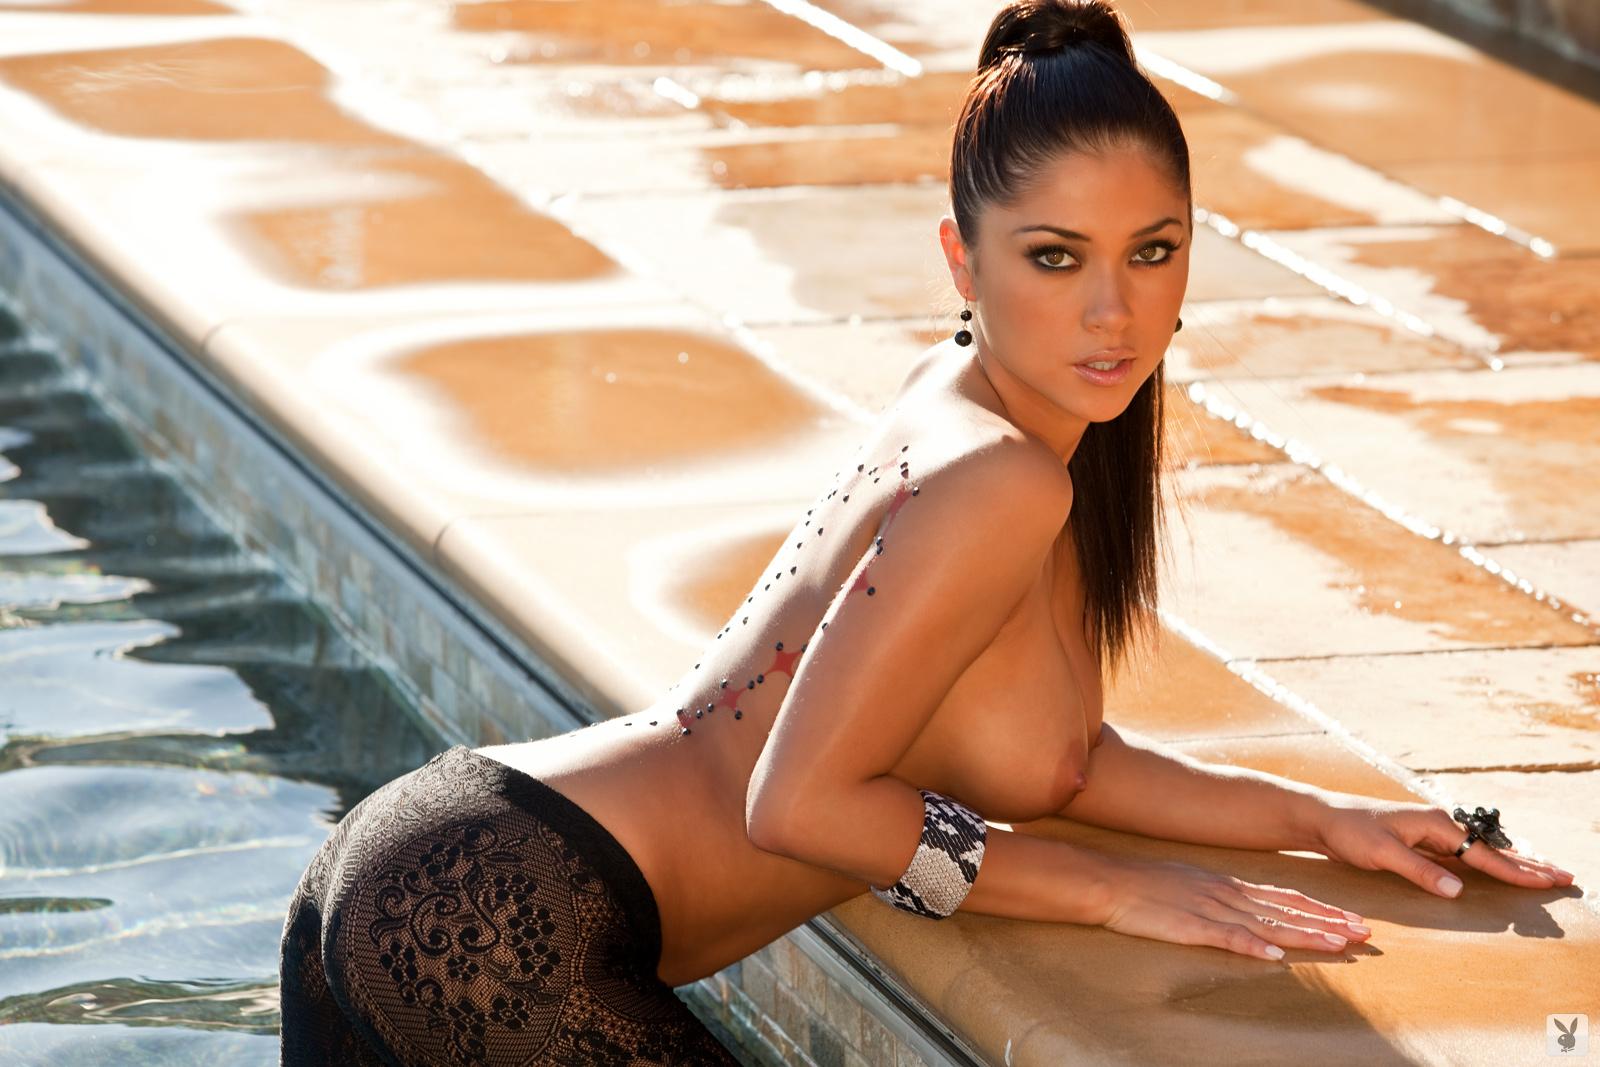 Arianny Celeste sex video mamy jak duży czarny kogut